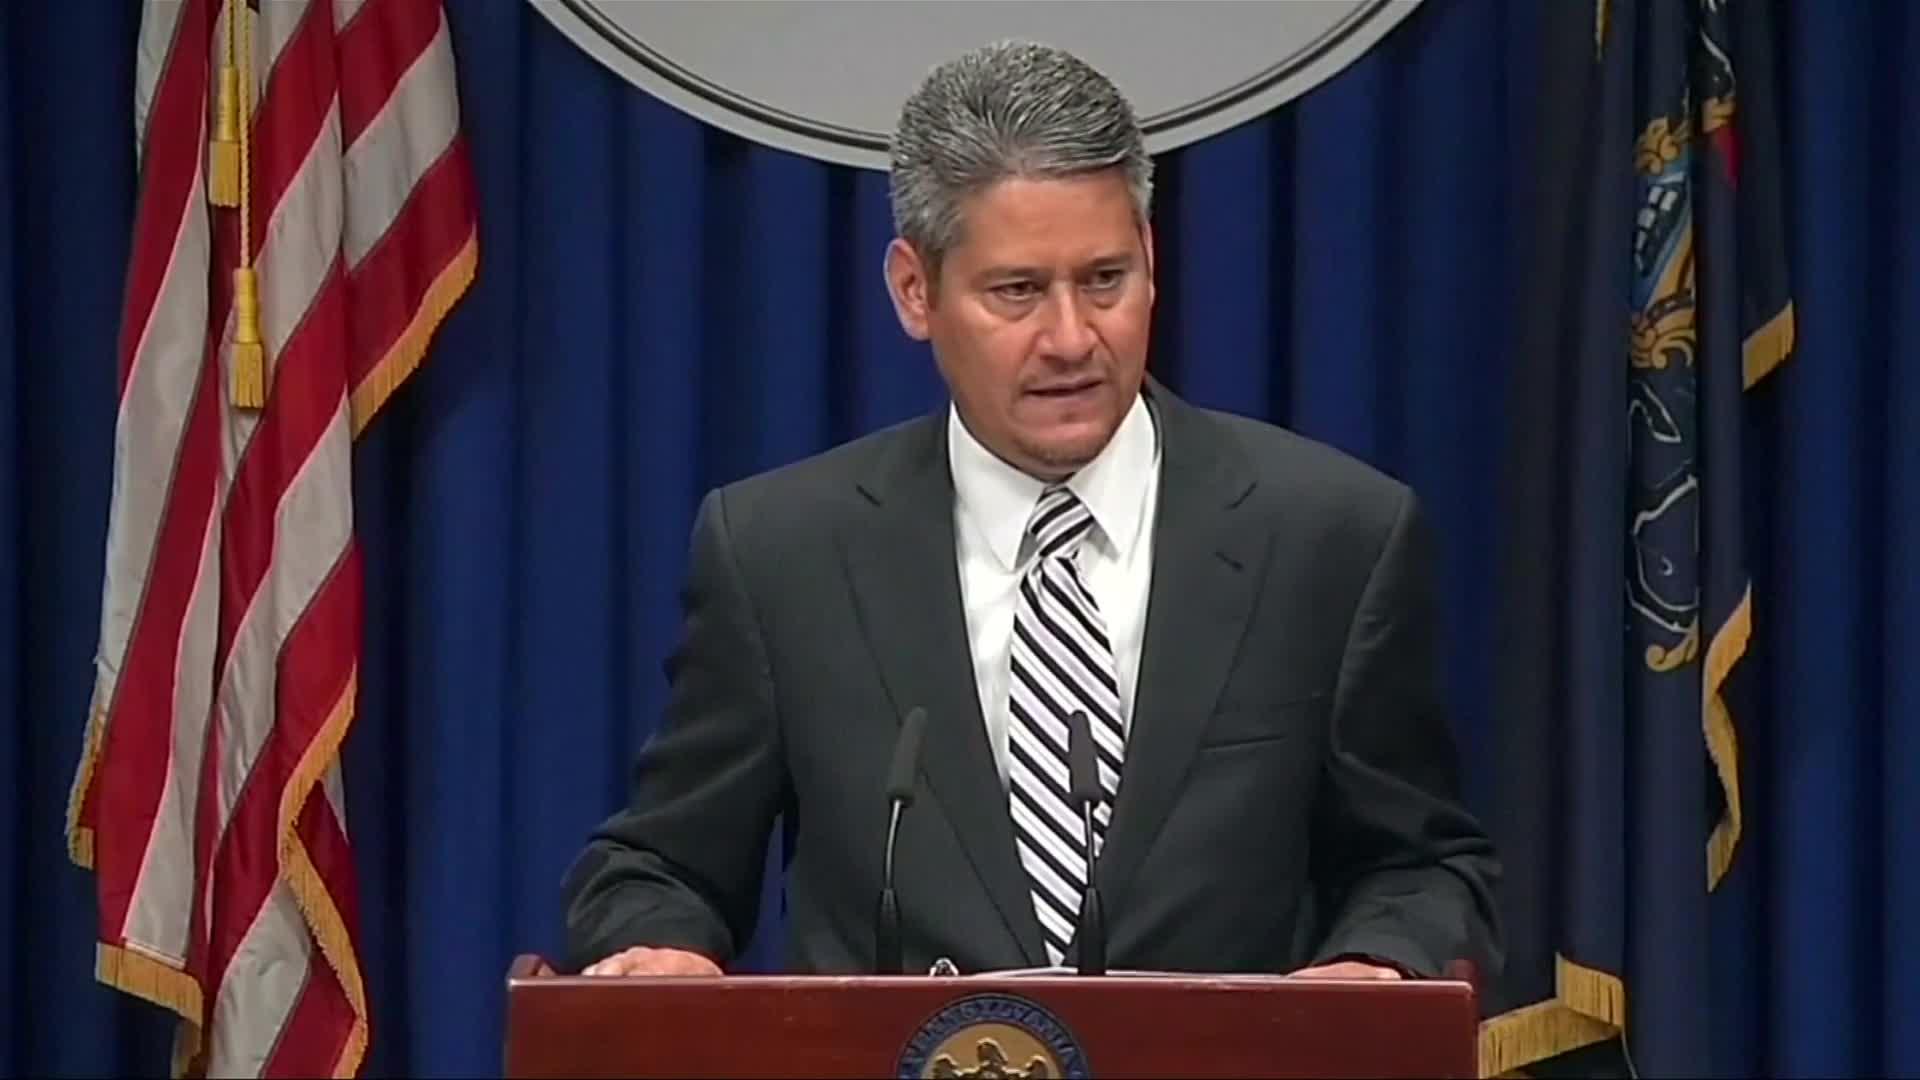 Pennsylvania's Secretary of State vows to prosecute voting violators